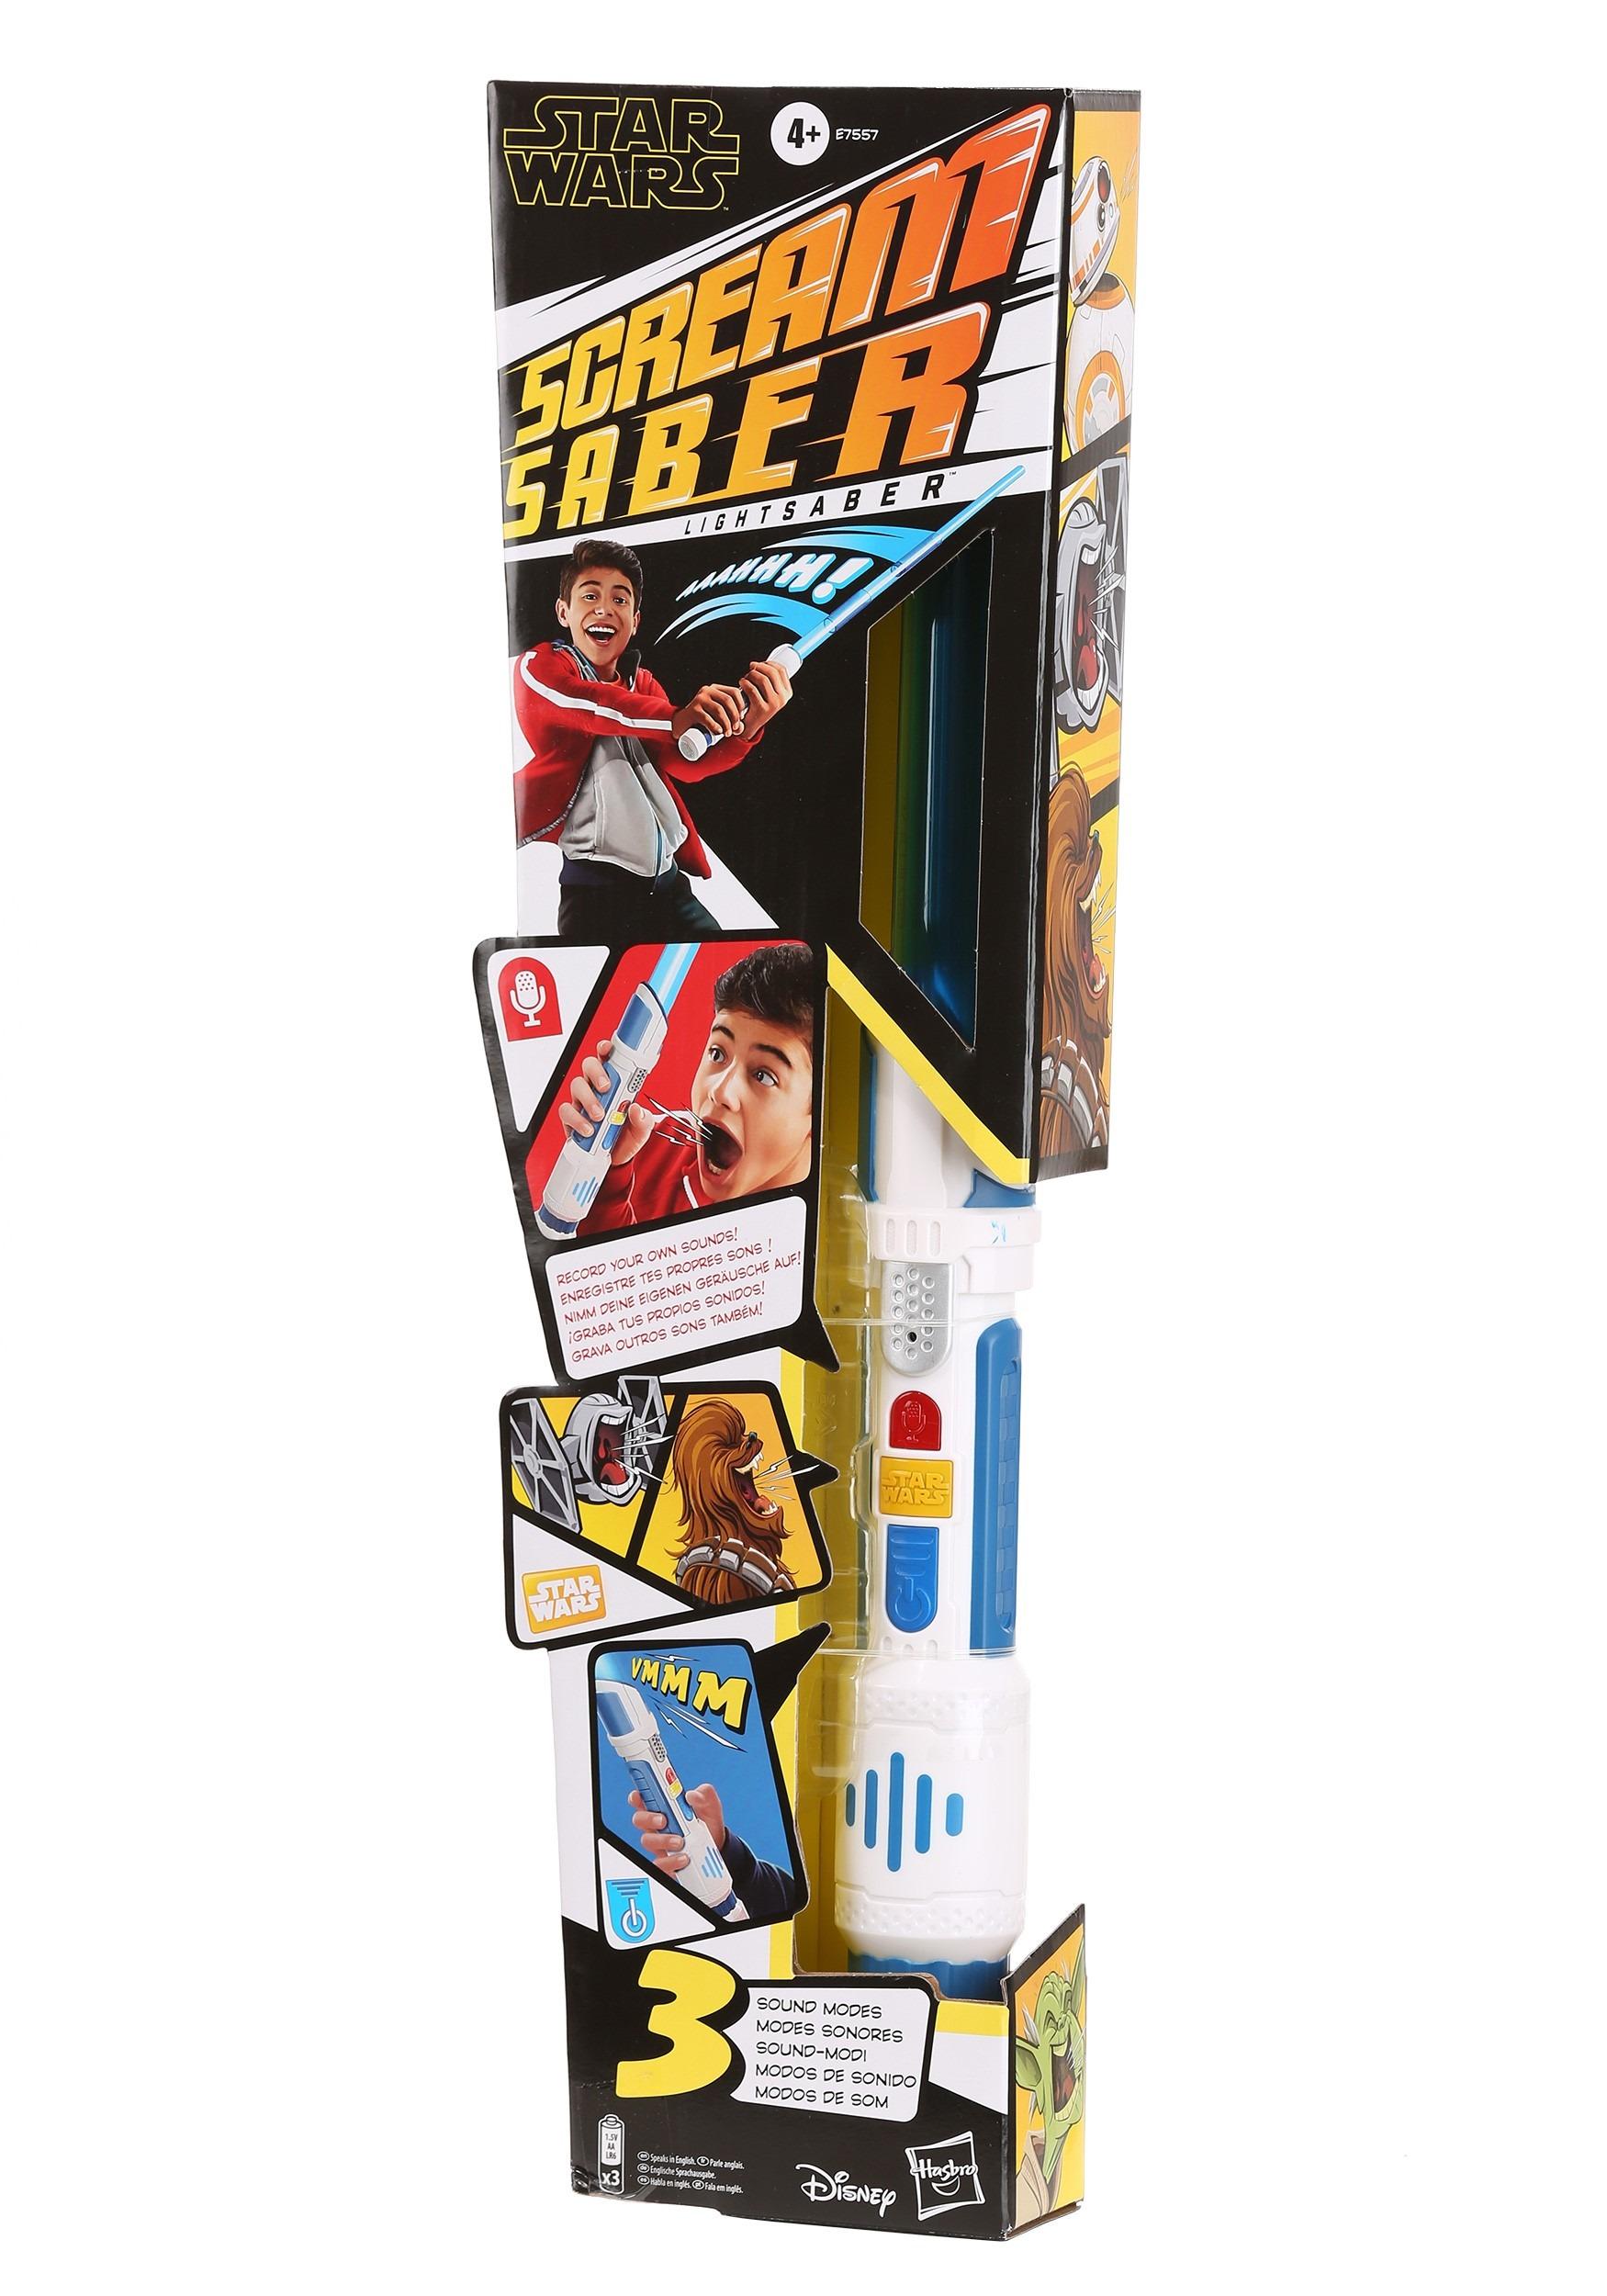 Star Wars Scream Saber Lightsaber with Sound Effects